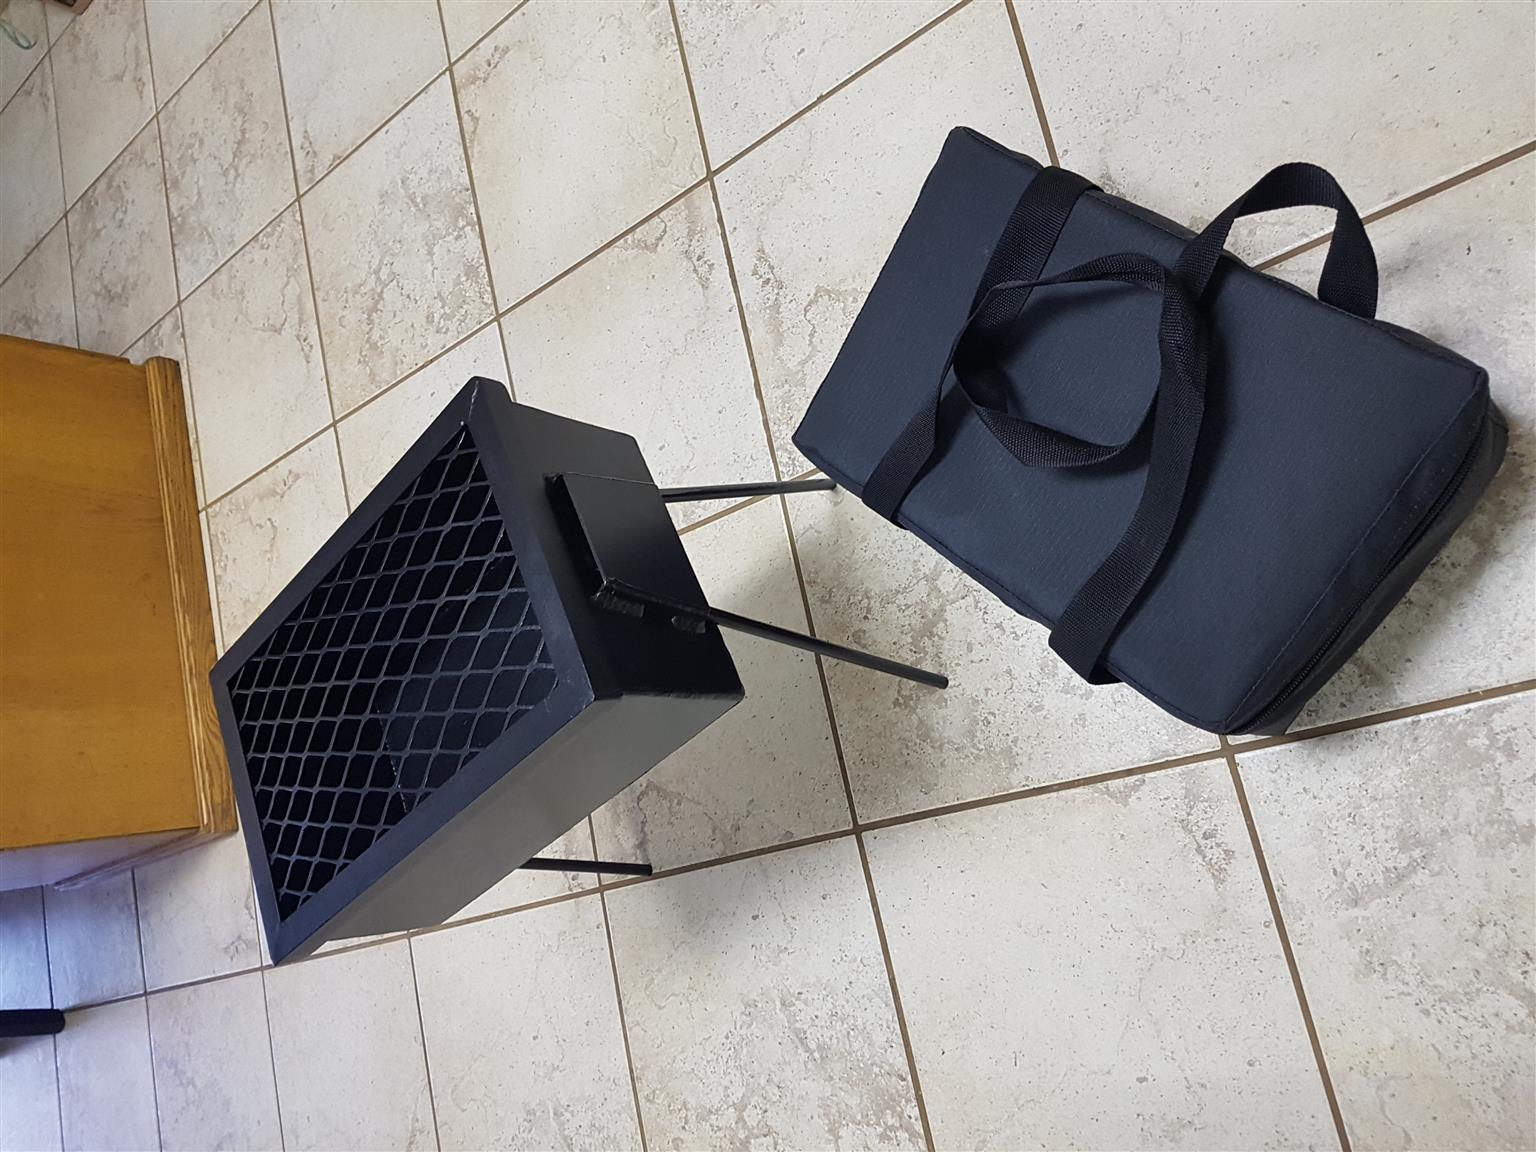 Braai , grid and bag